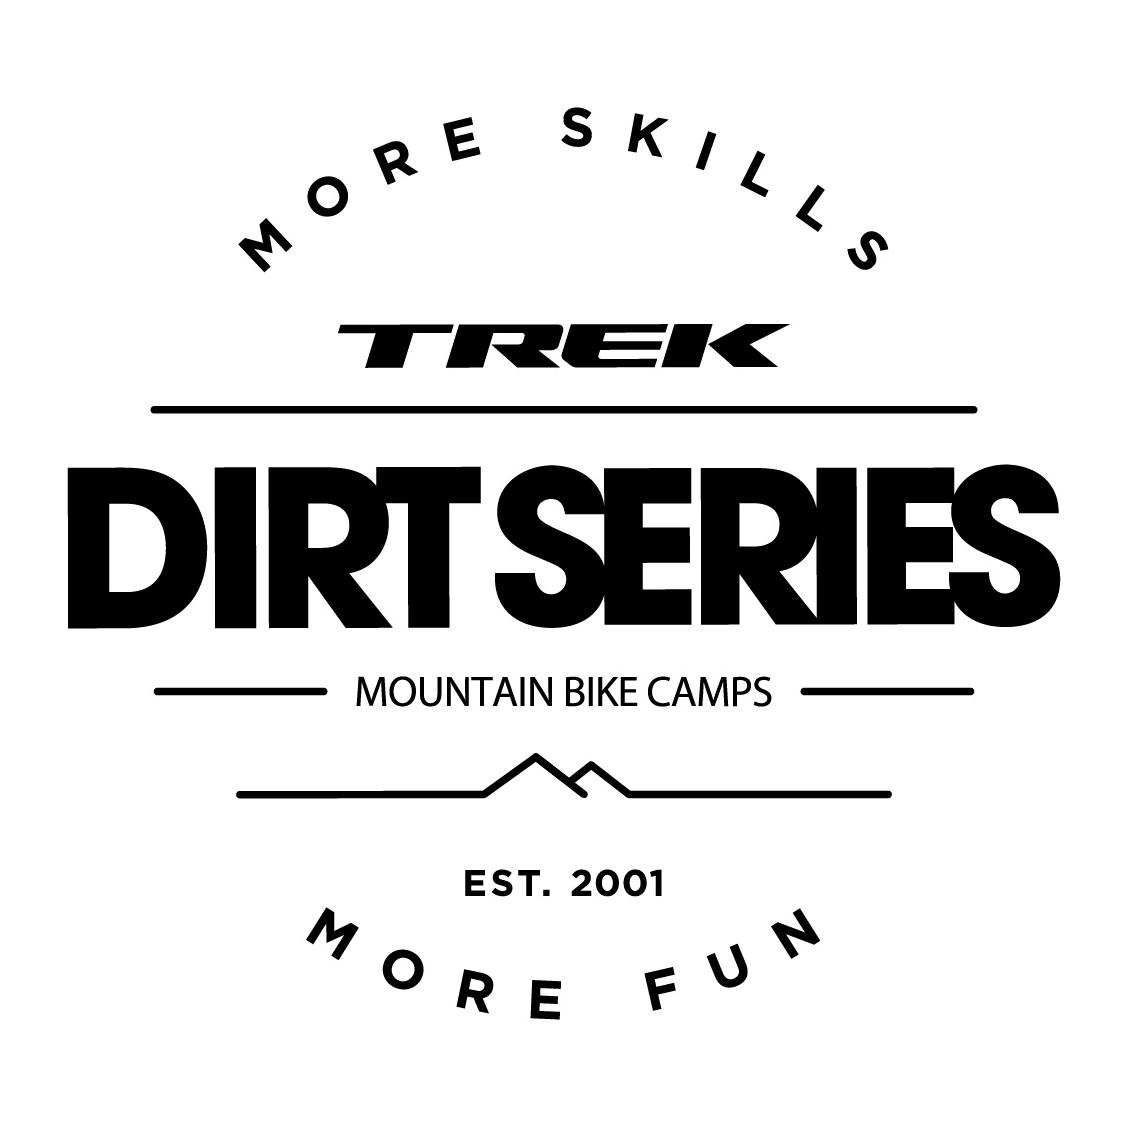 Dirt Series Mountain Bike Camp - Calgary, AB